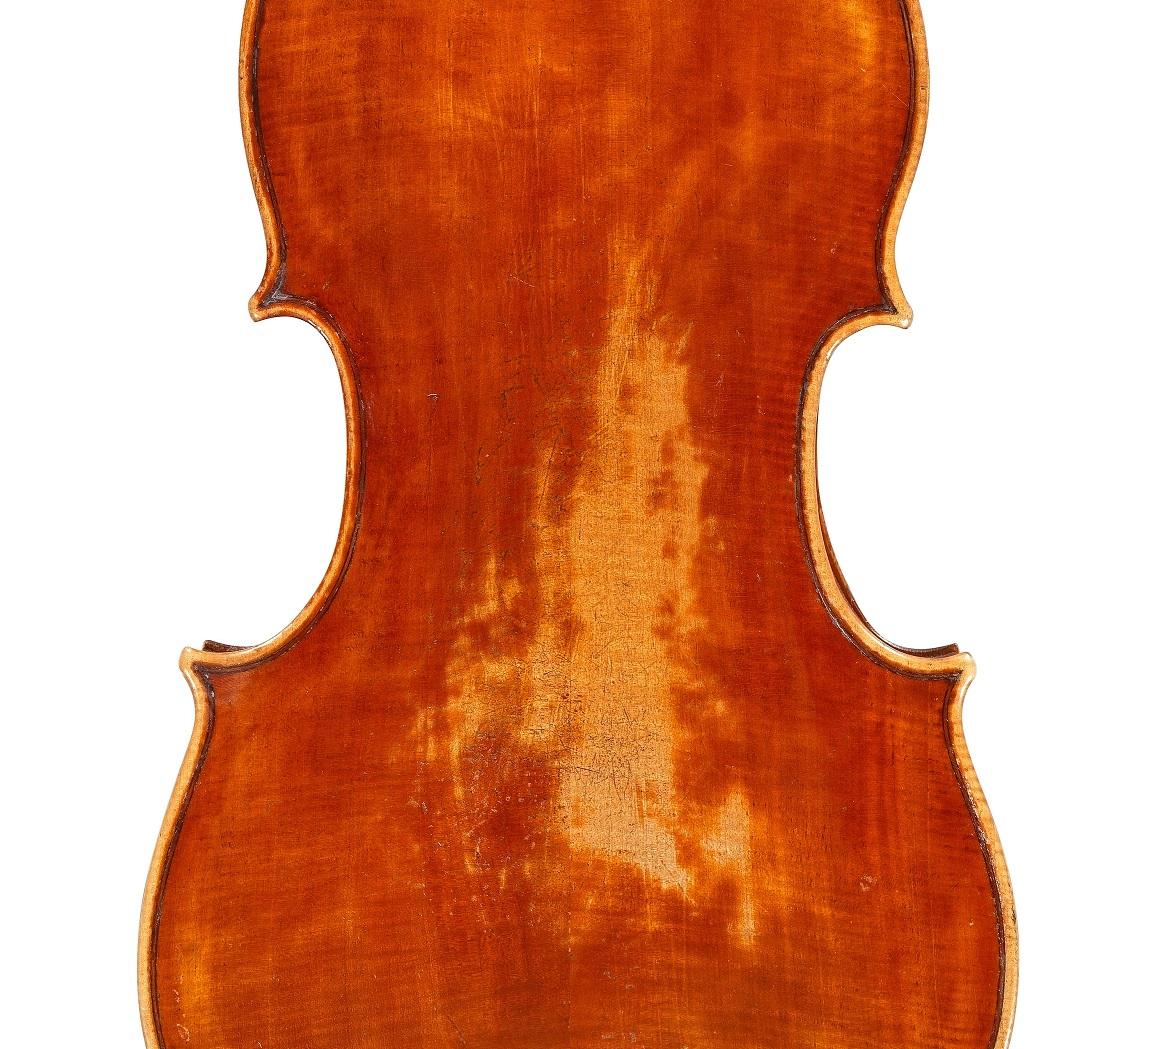 back of a viola by Lorenzo Storioni, 1787